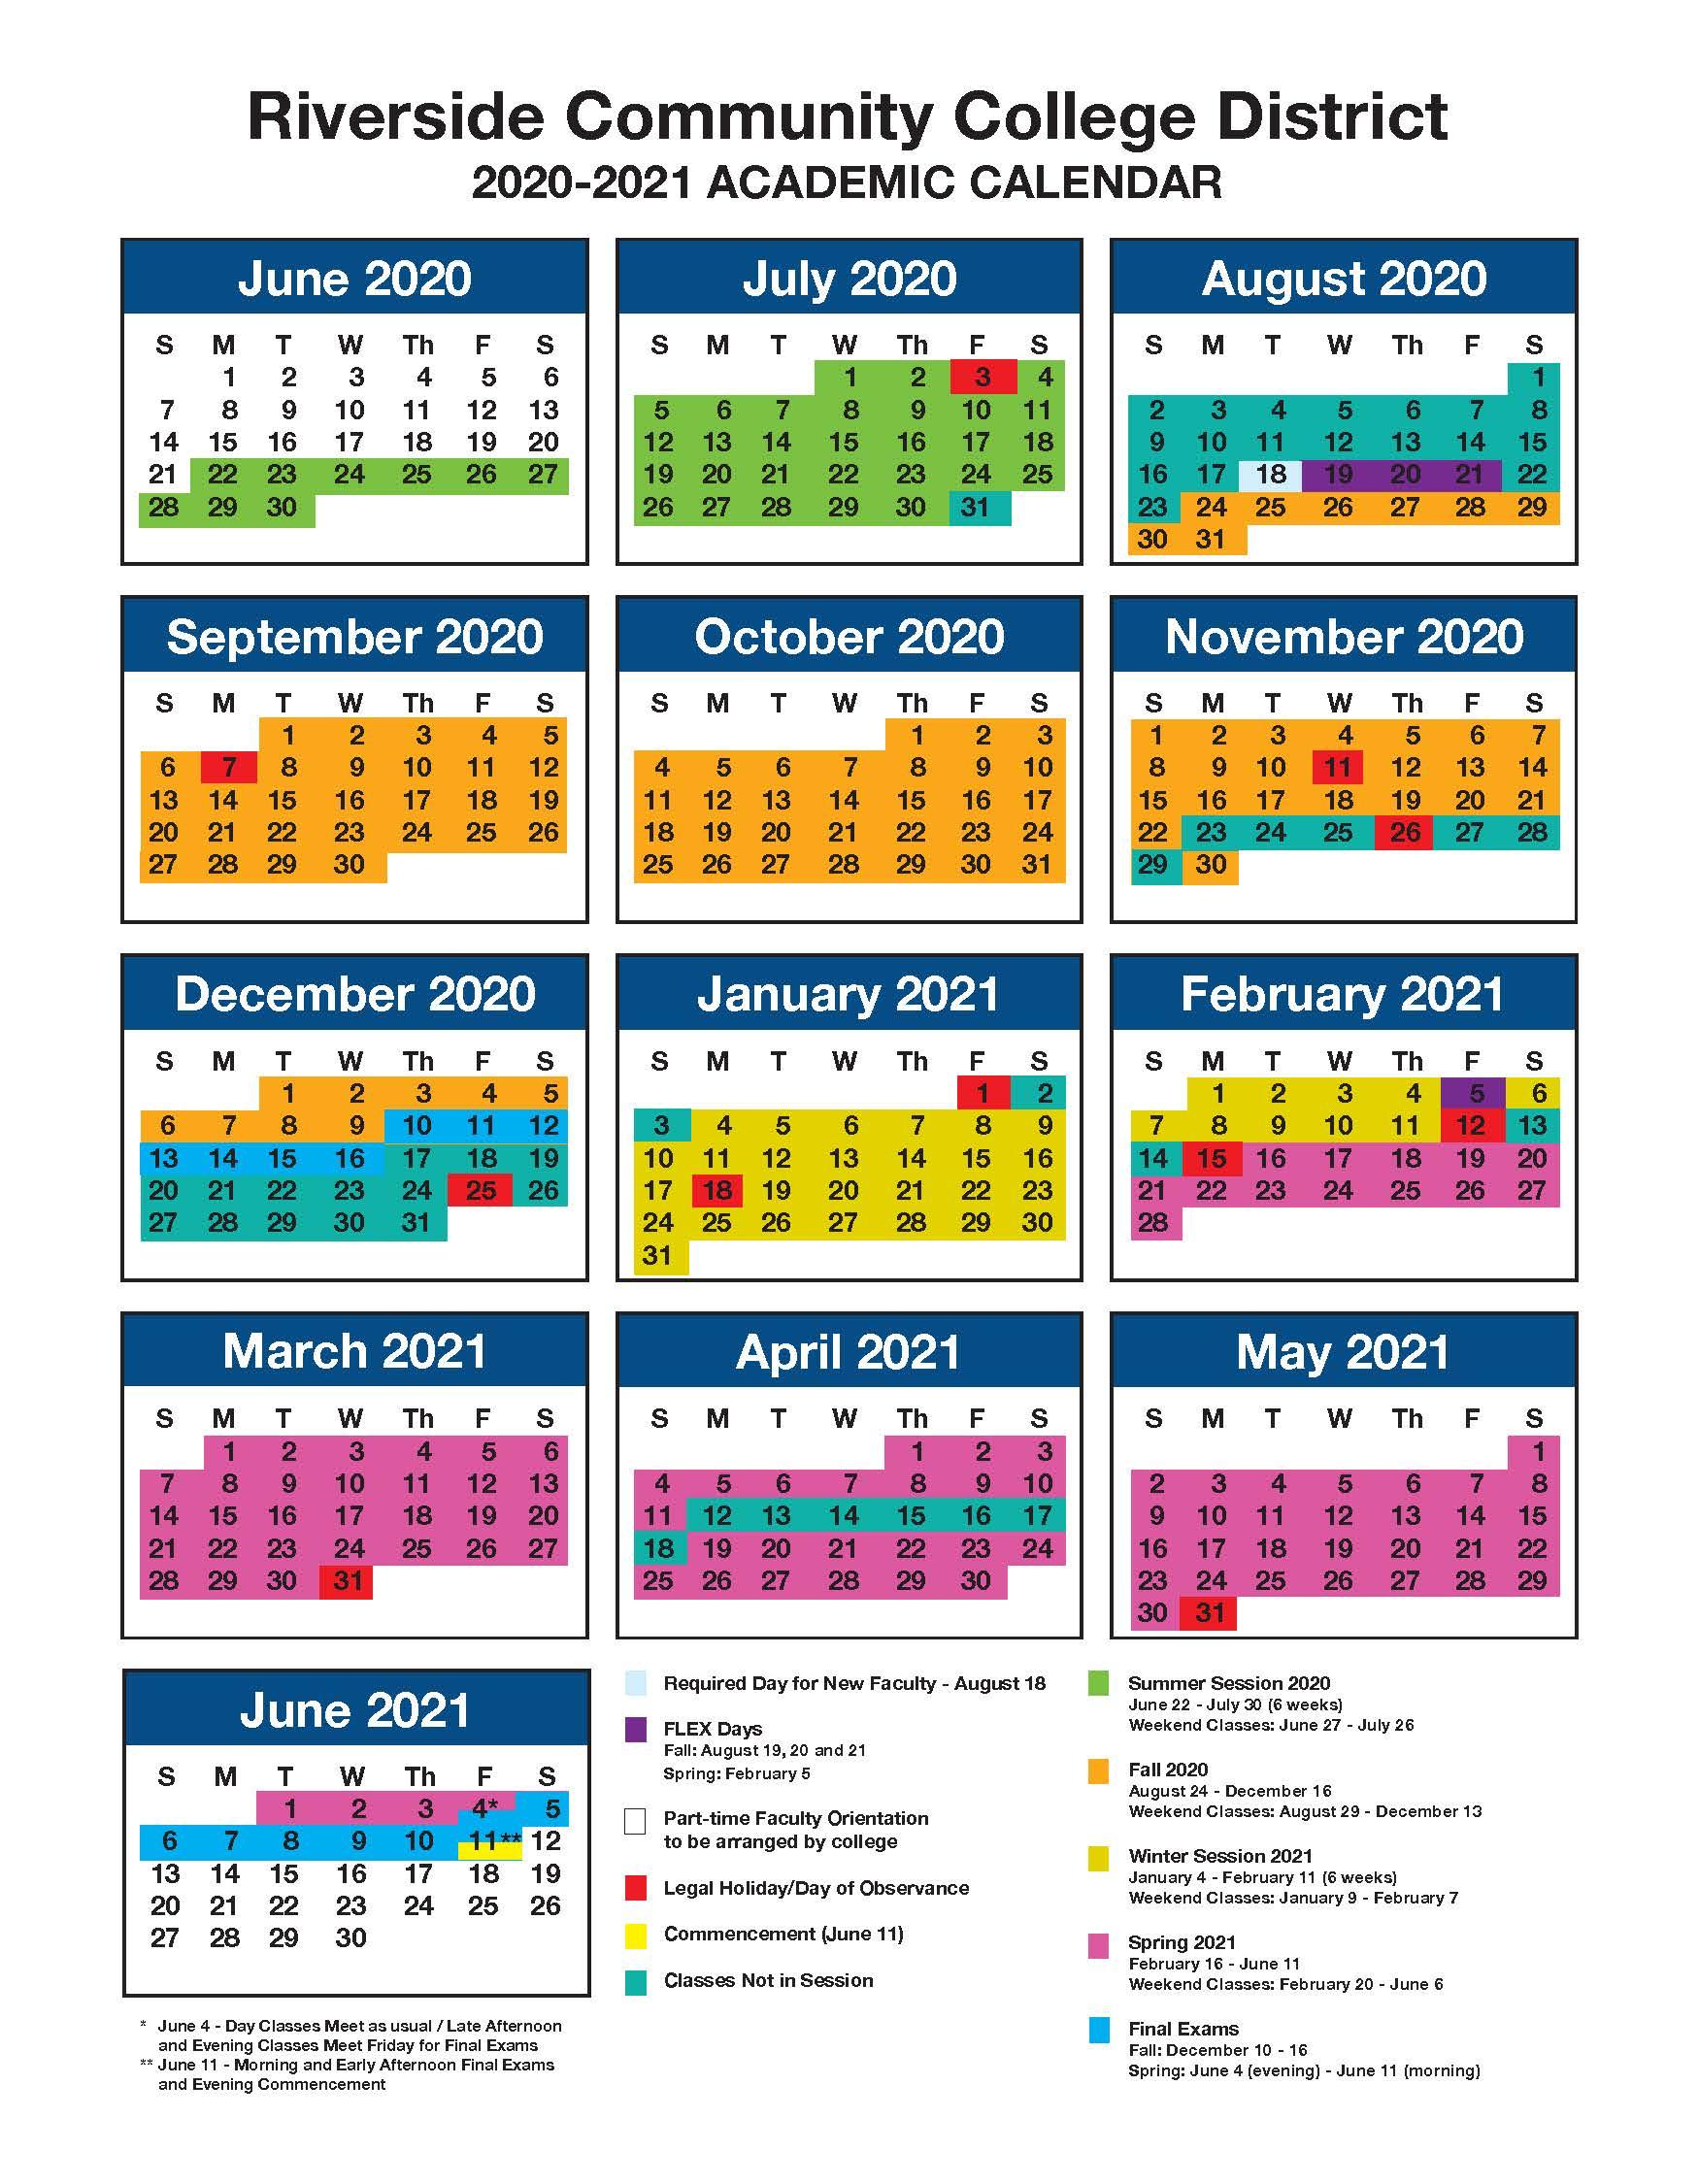 Academic Calendar With Regard To University Of Southern California School Calendar 2021 2020